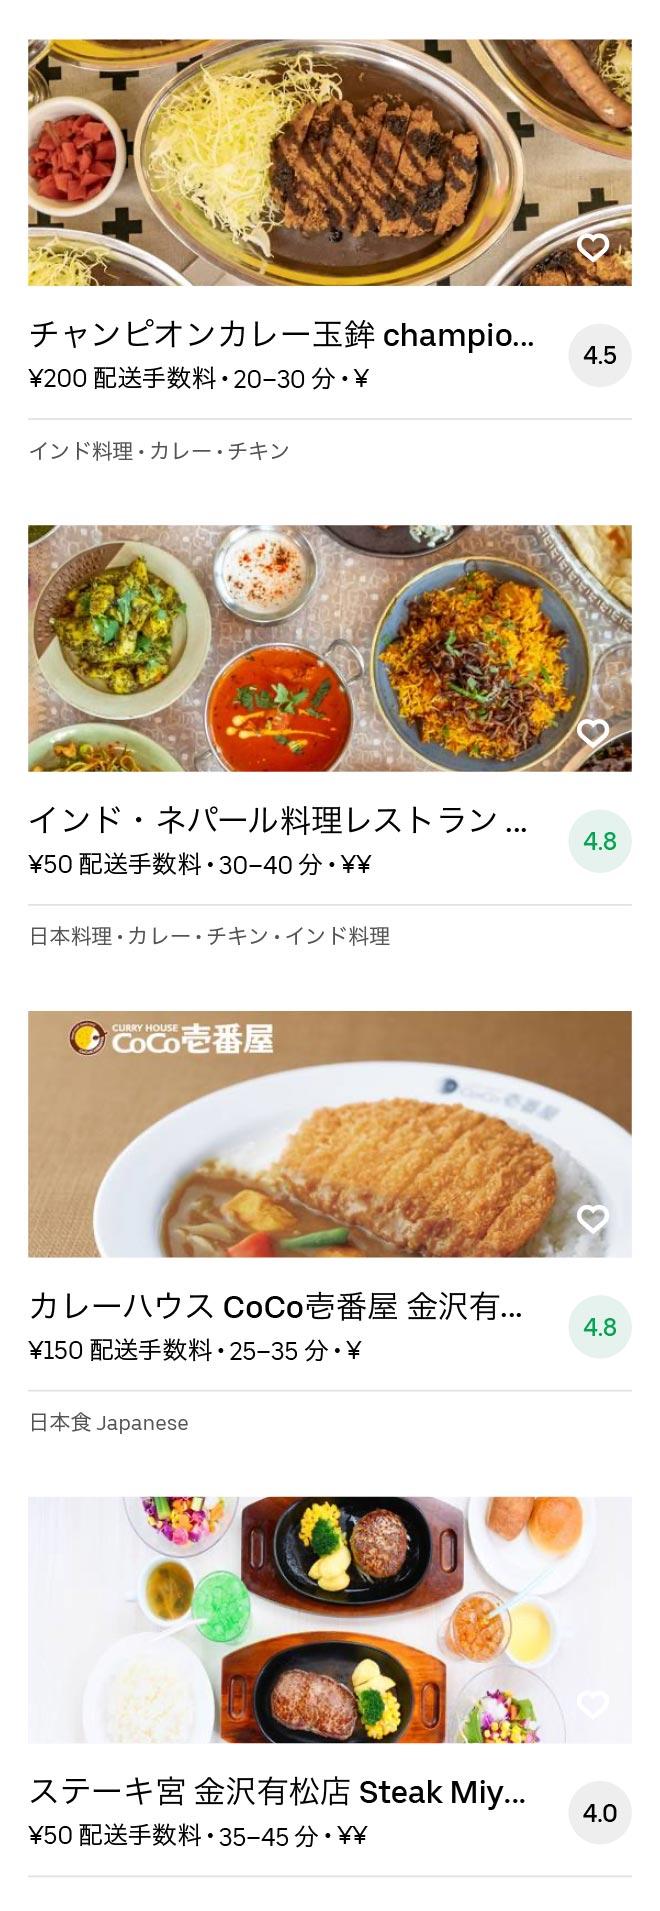 Nishi kanazawa menu 2009 04